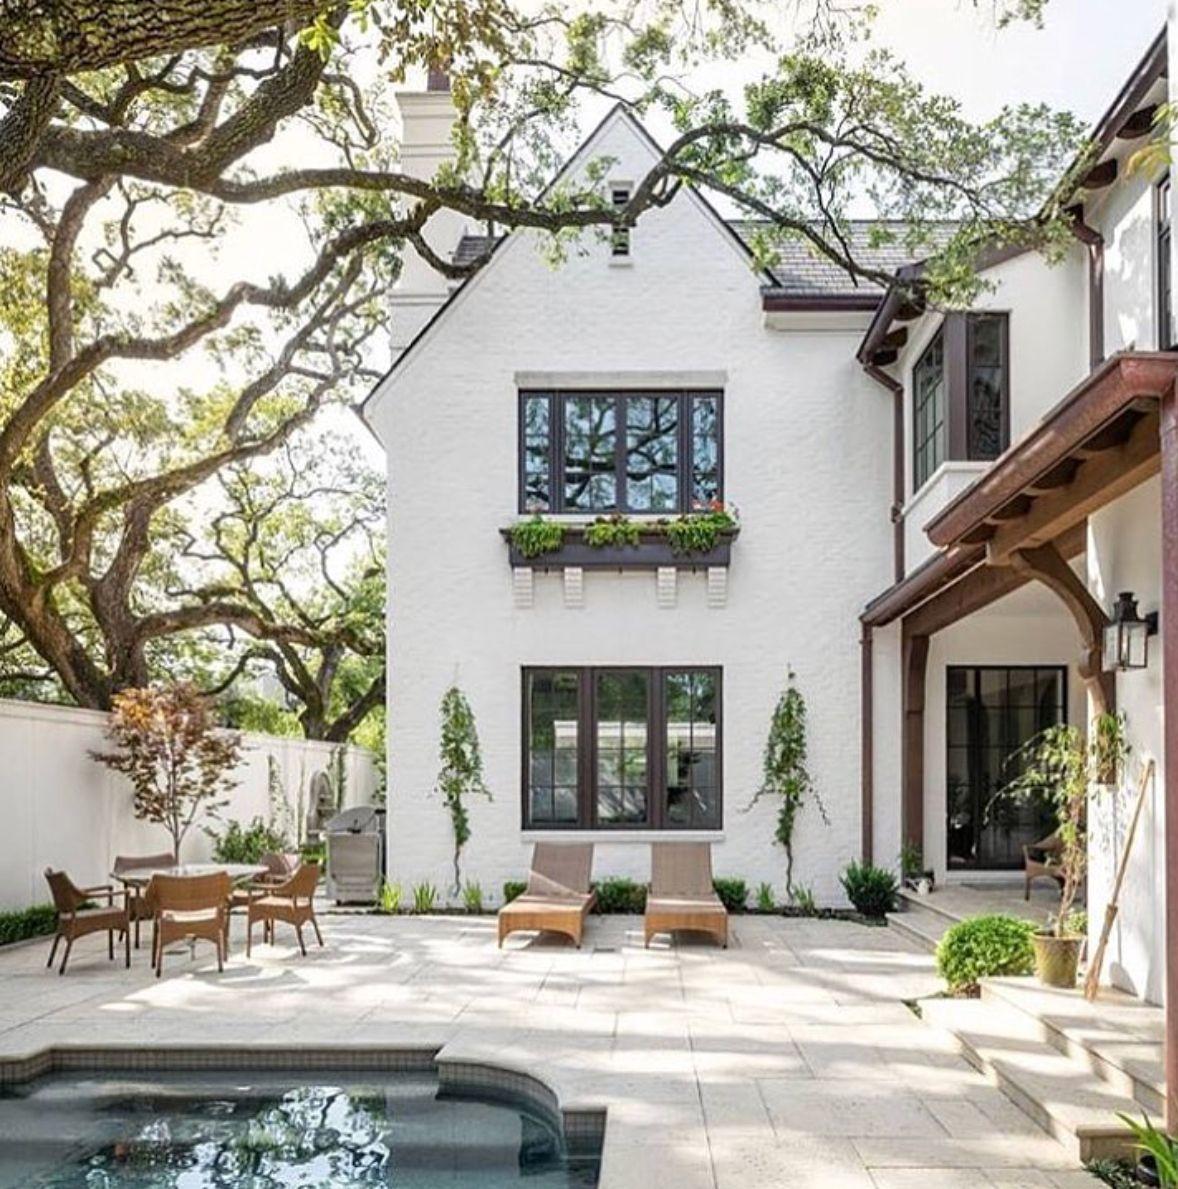 White Stucco And Pool Courtyard House Exterior Beautiful Homes Backyard Pool